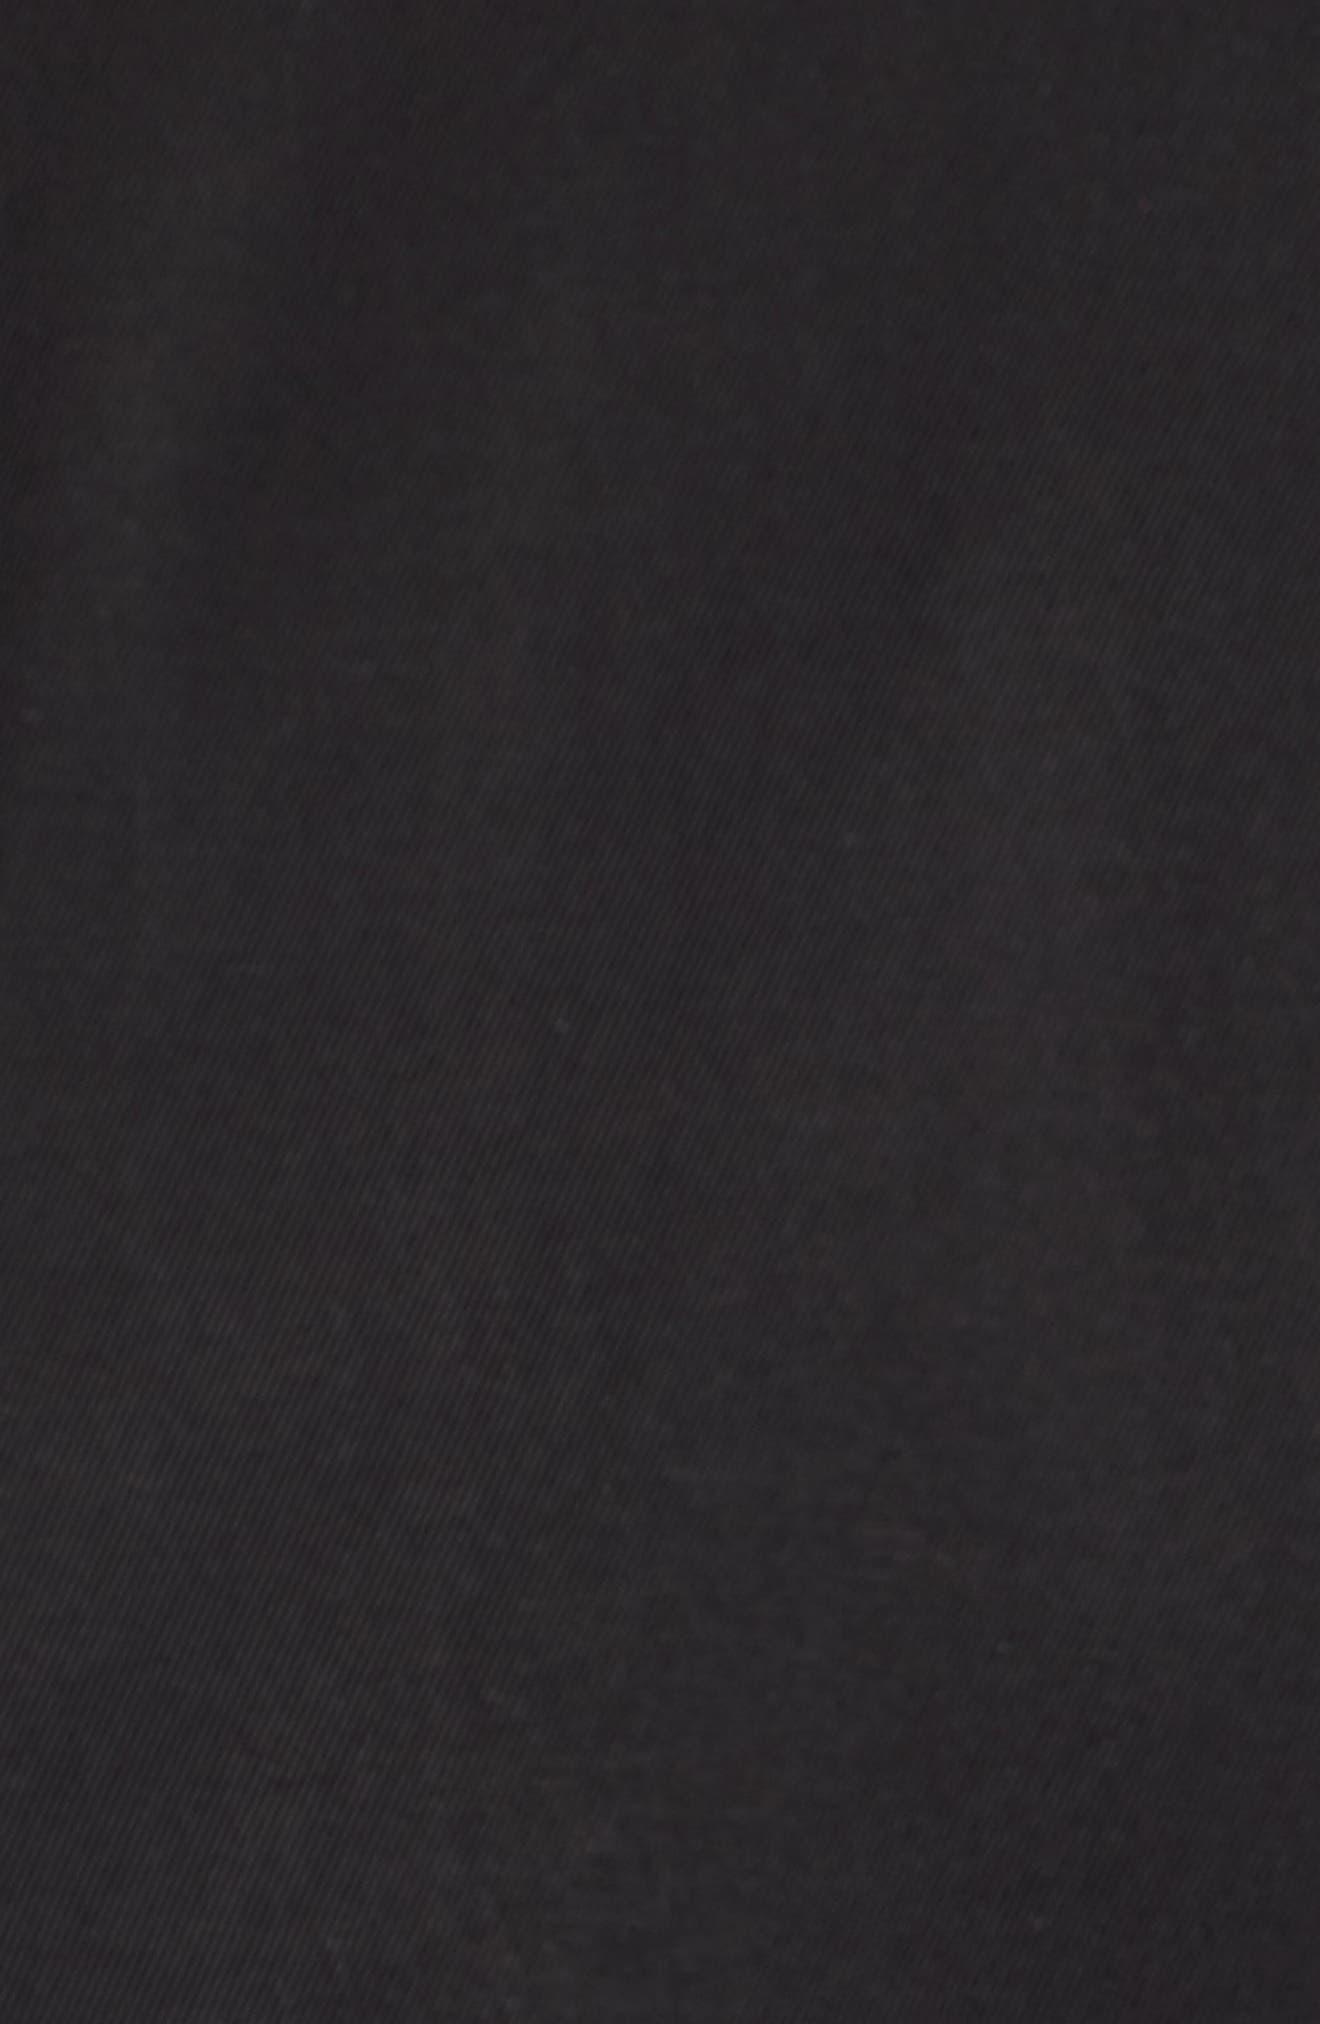 Twill Iconic Jacket,                             Alternate thumbnail 6, color,                             001